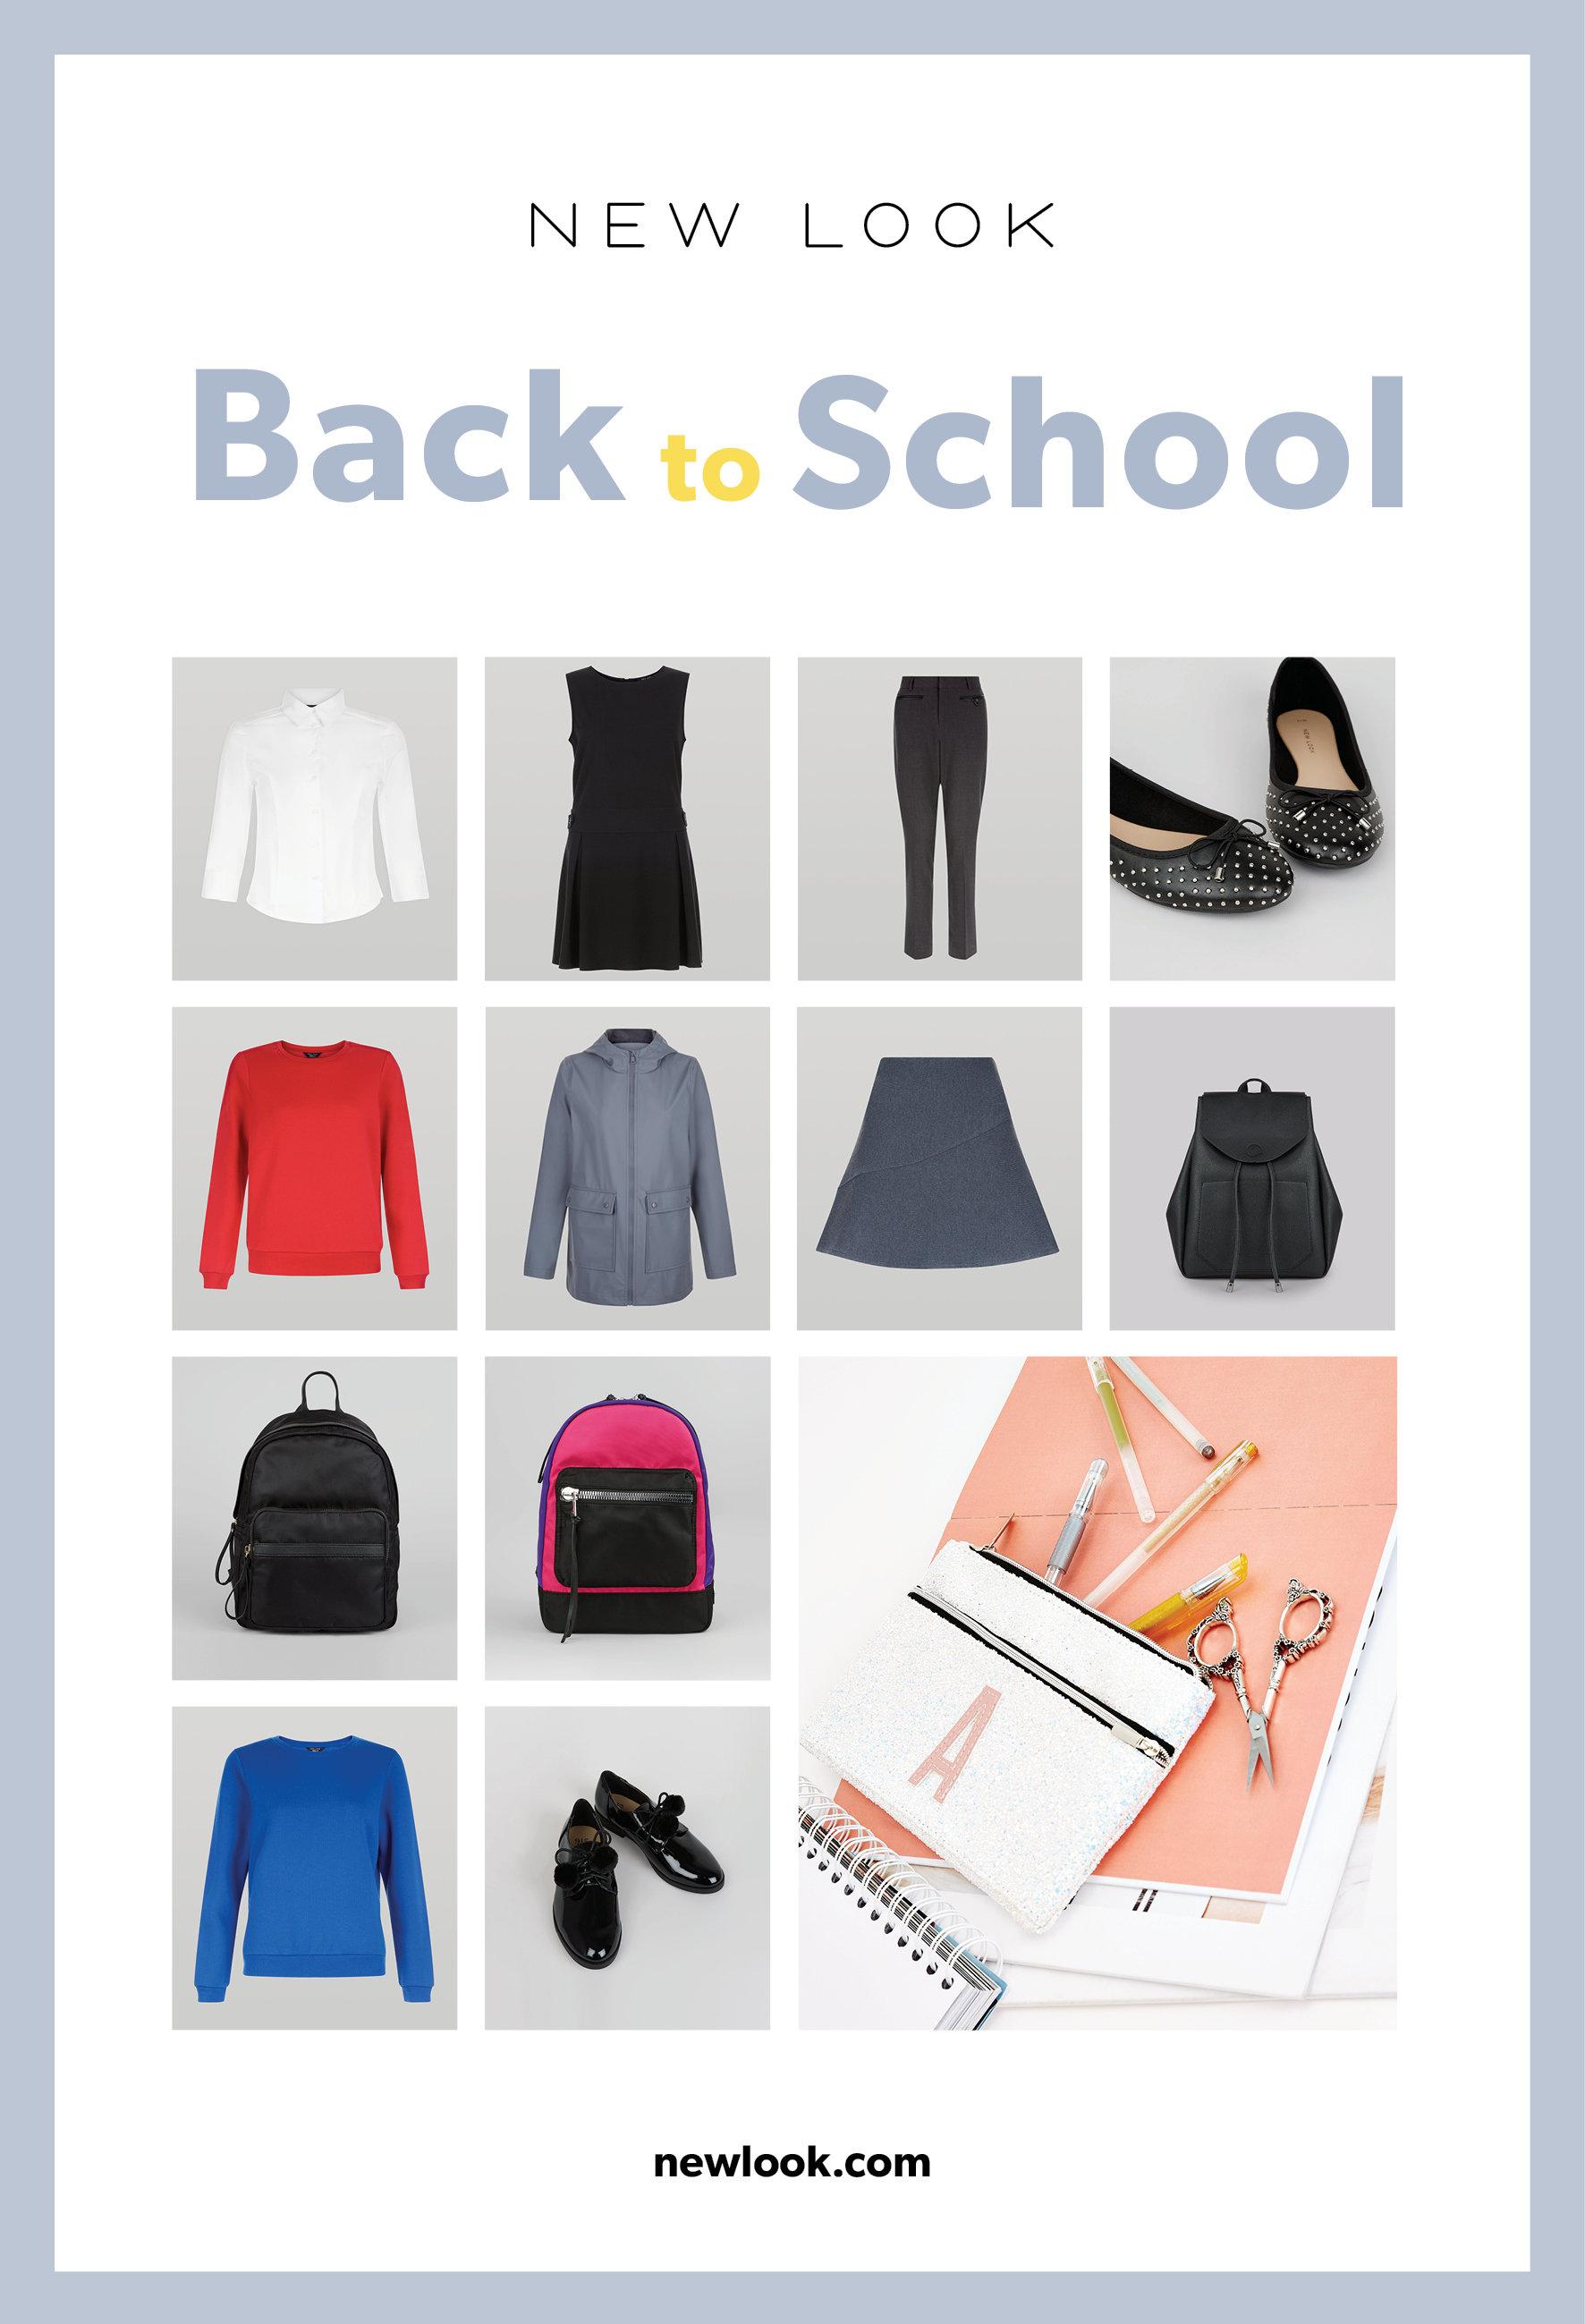 BACK TO SCHOOL Z NEW LOOK